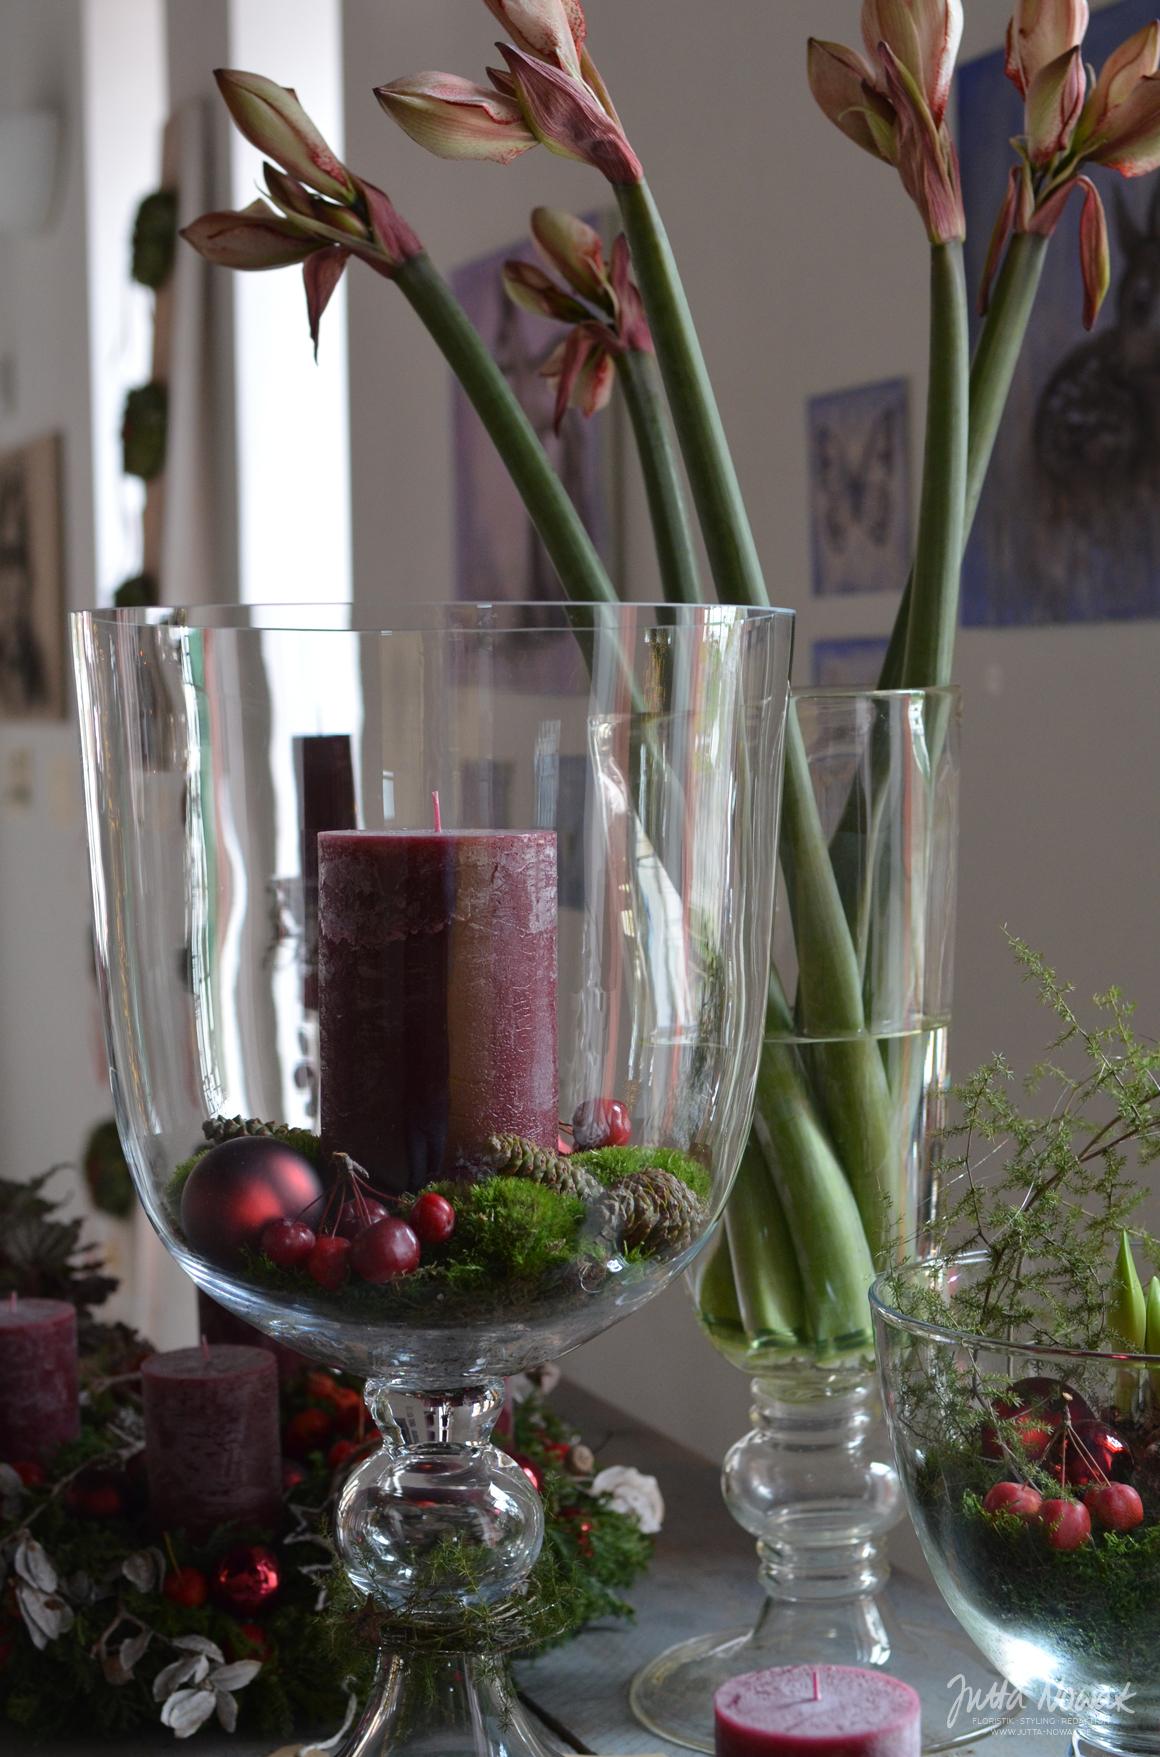 Jutta Nowak: Adventsausstellung 2015, Glaspokale mit Kerzen und Amaryllis